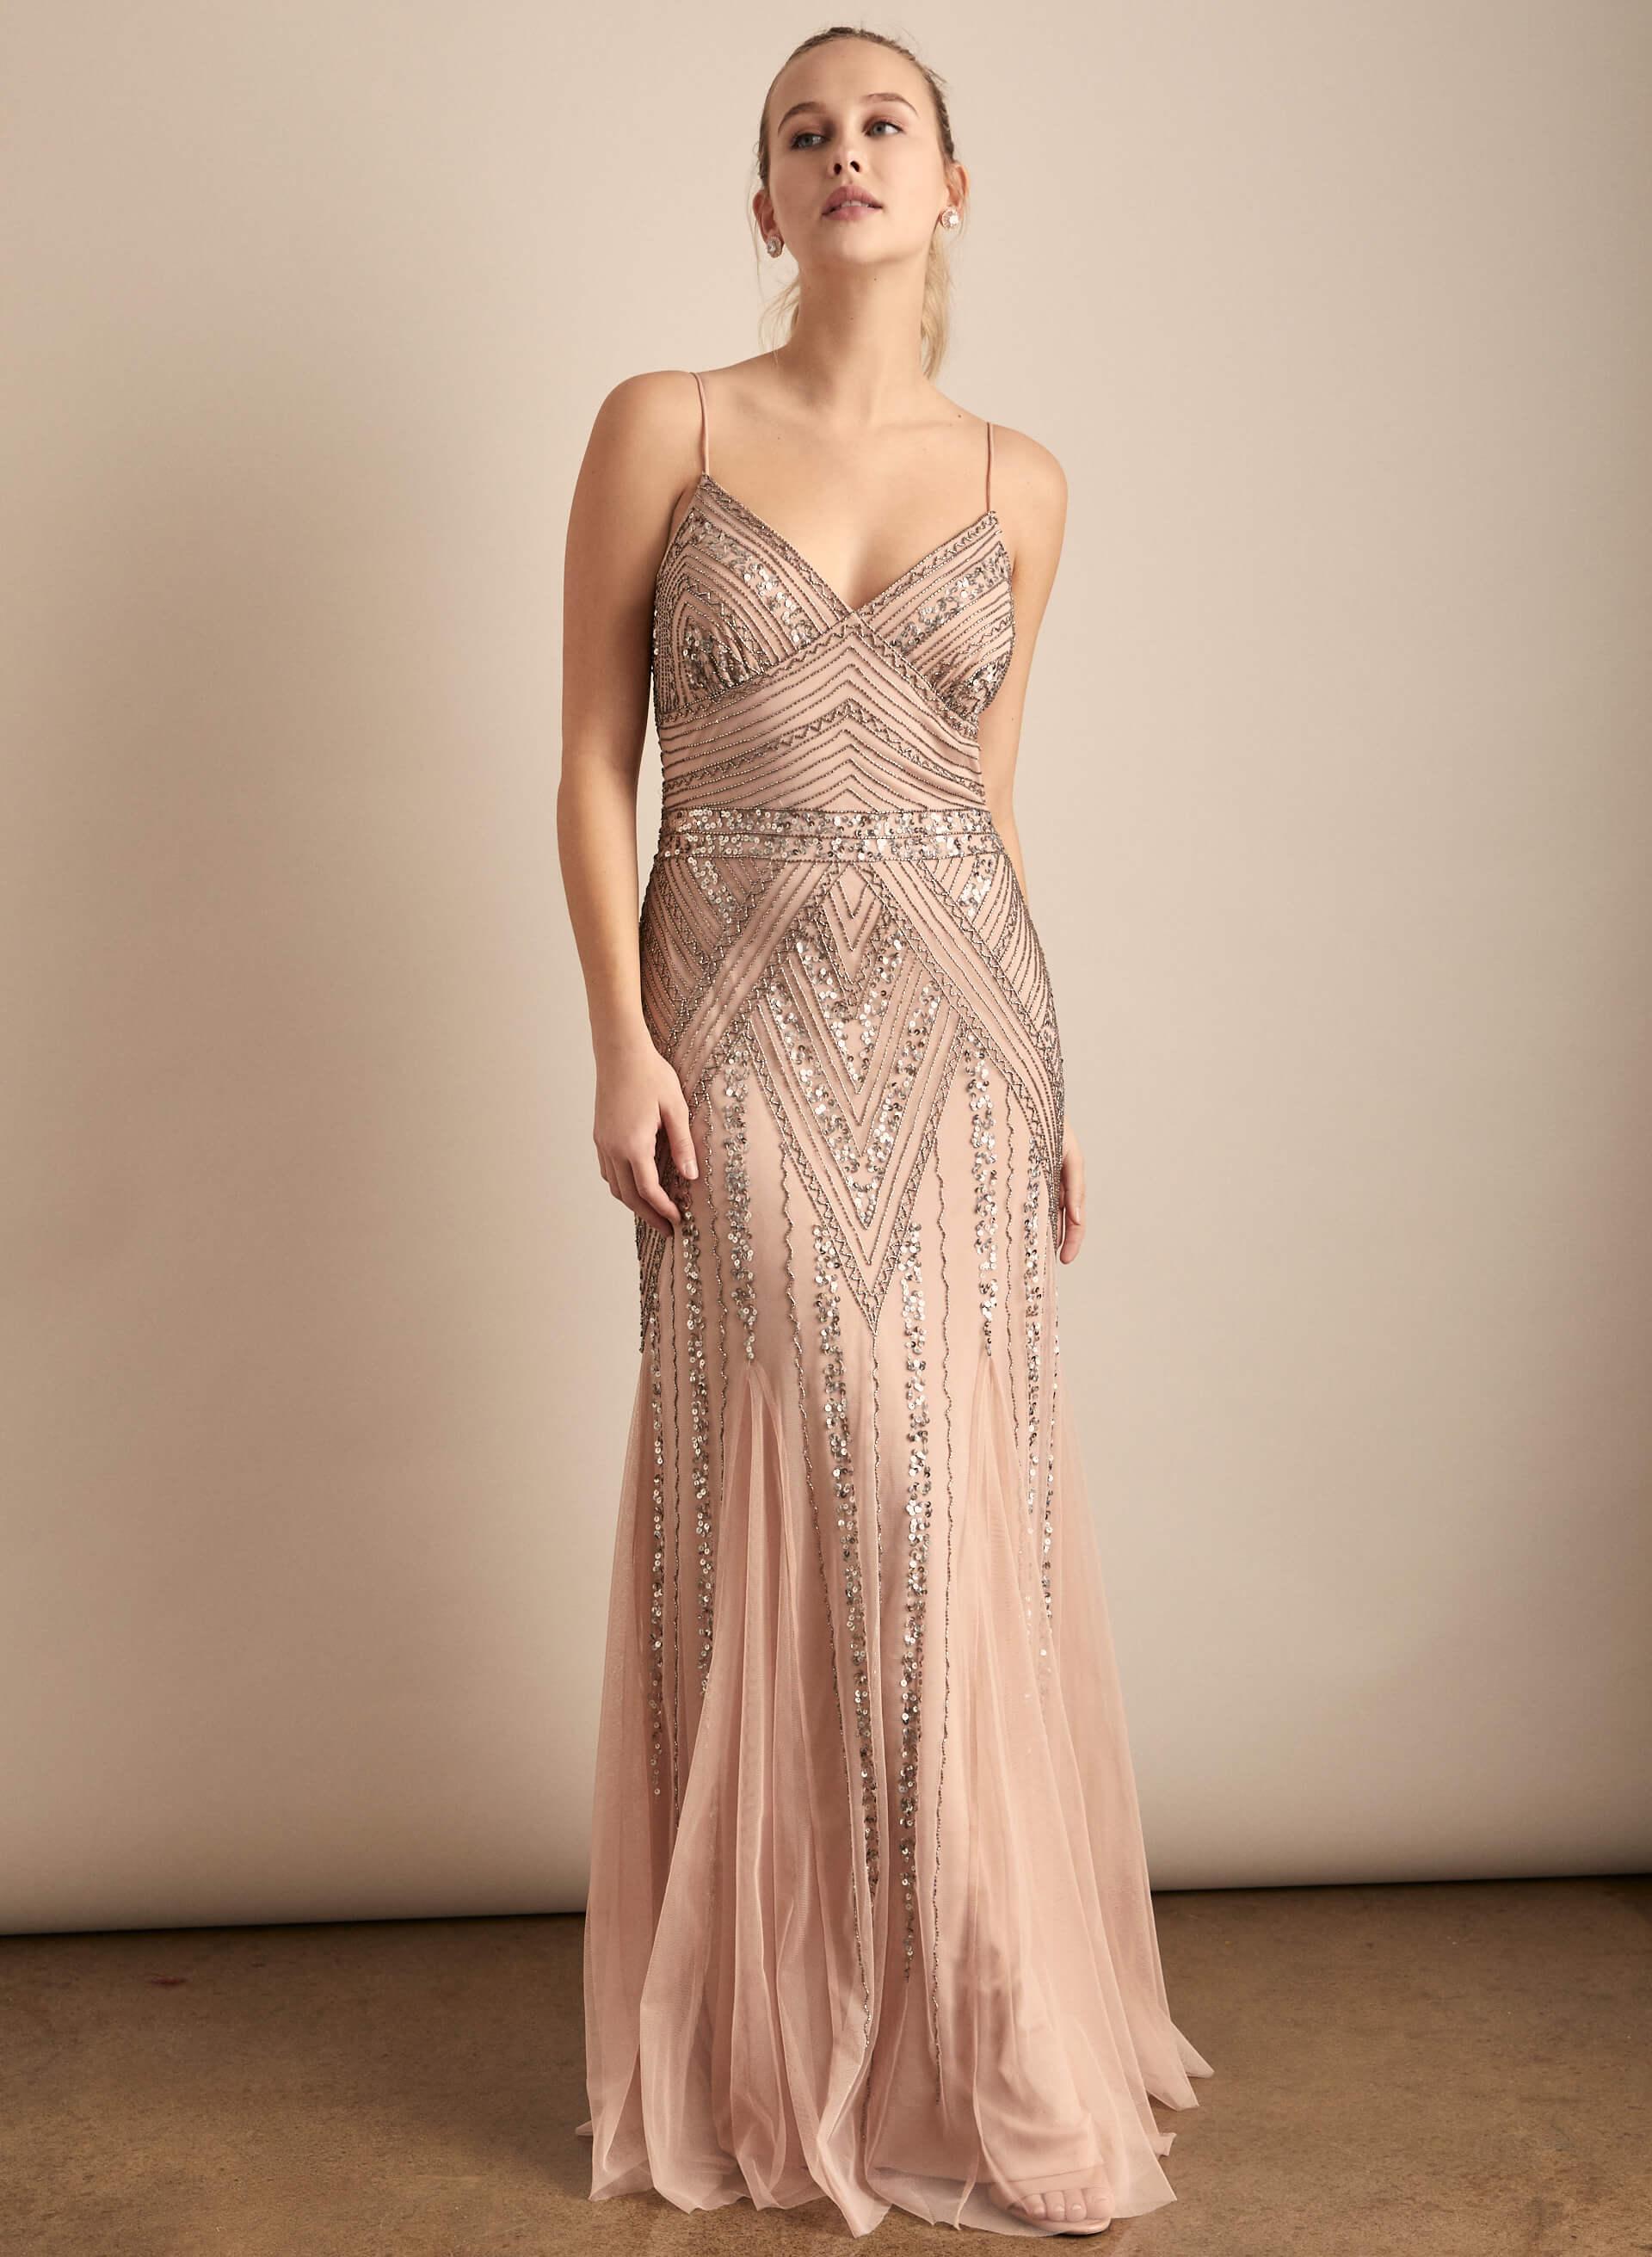 Prom - Melanie Lyne - 2020 - Marina - Robe en maille filet ornementée